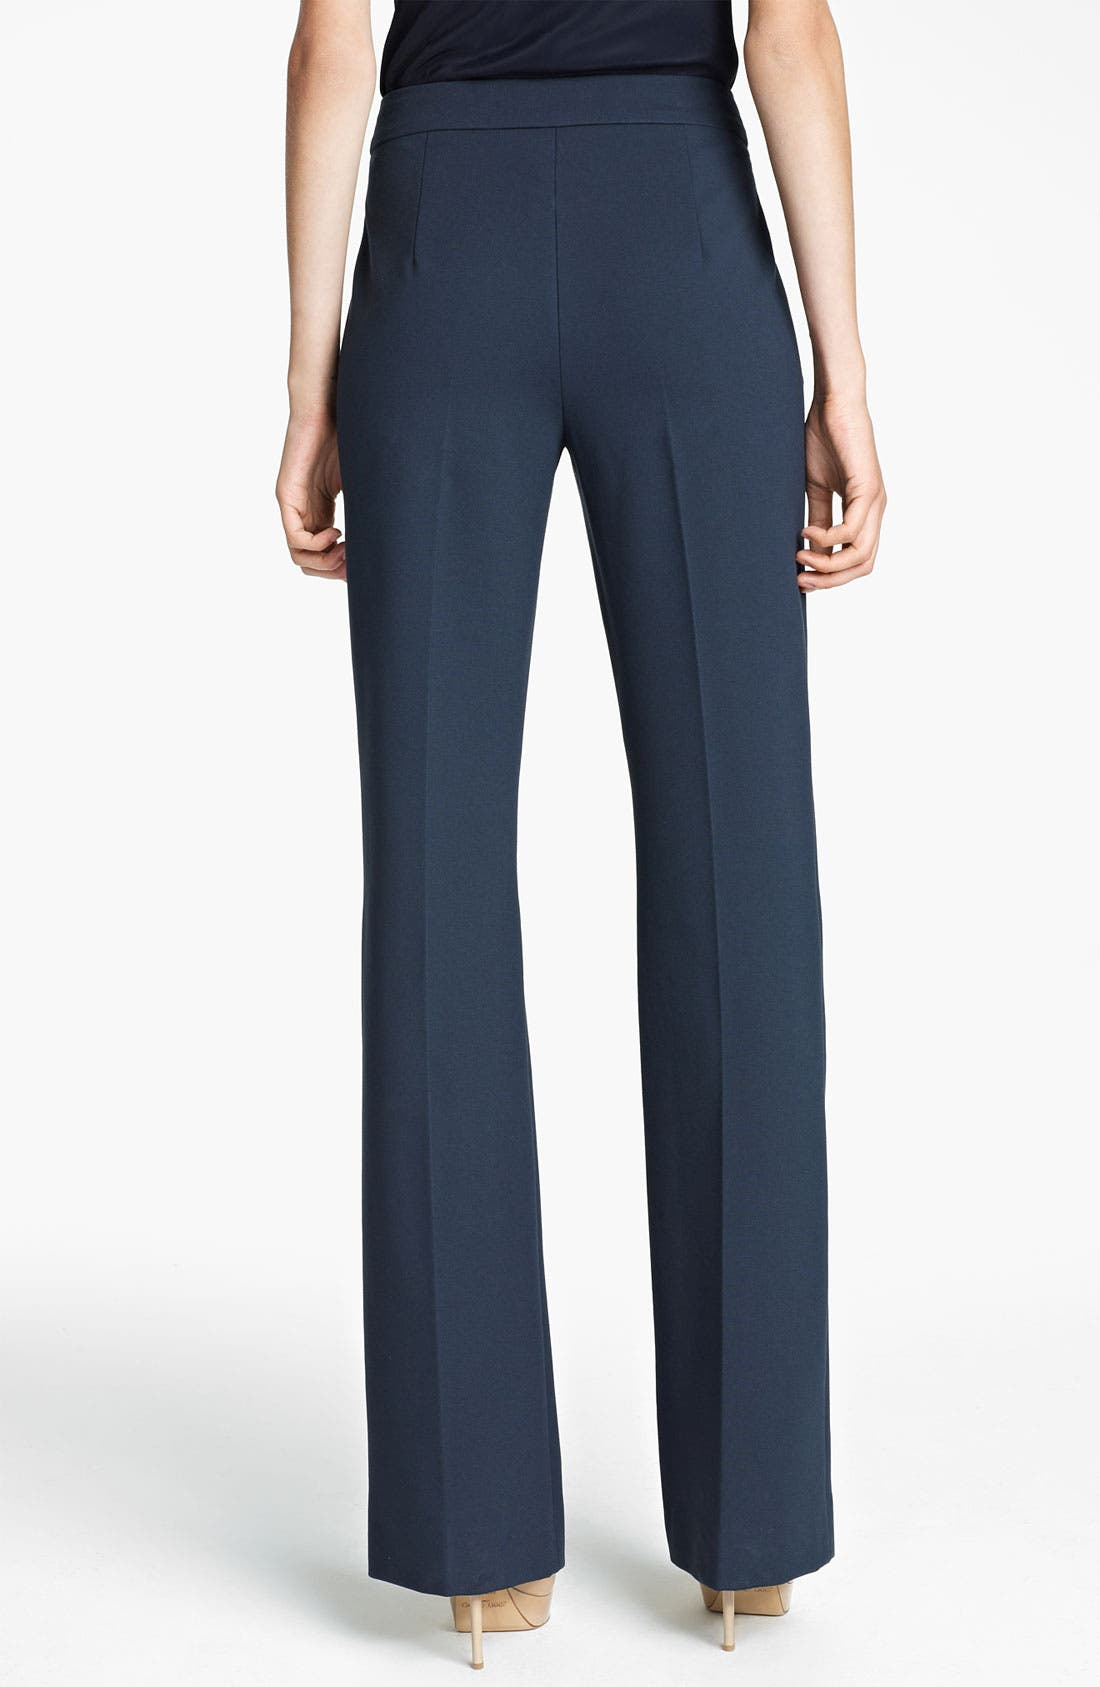 Alternate Image 2  - Max Mara 'Agus' Jersey Pants